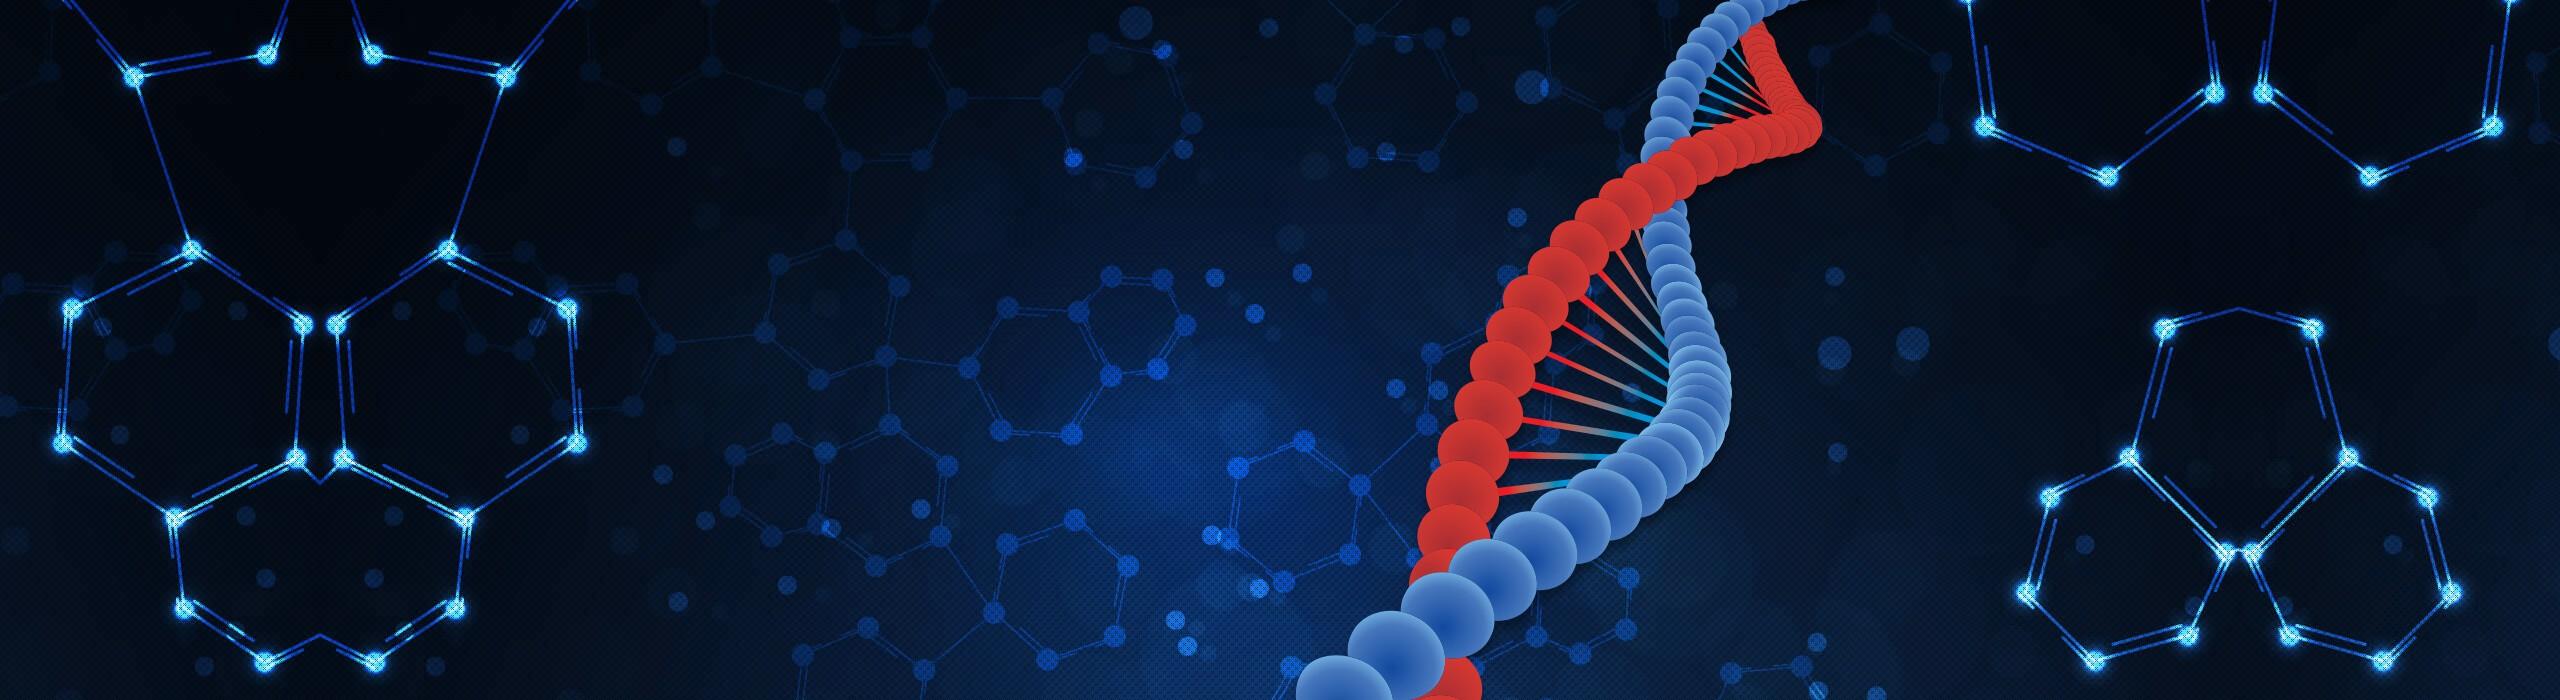 molecular-banner1